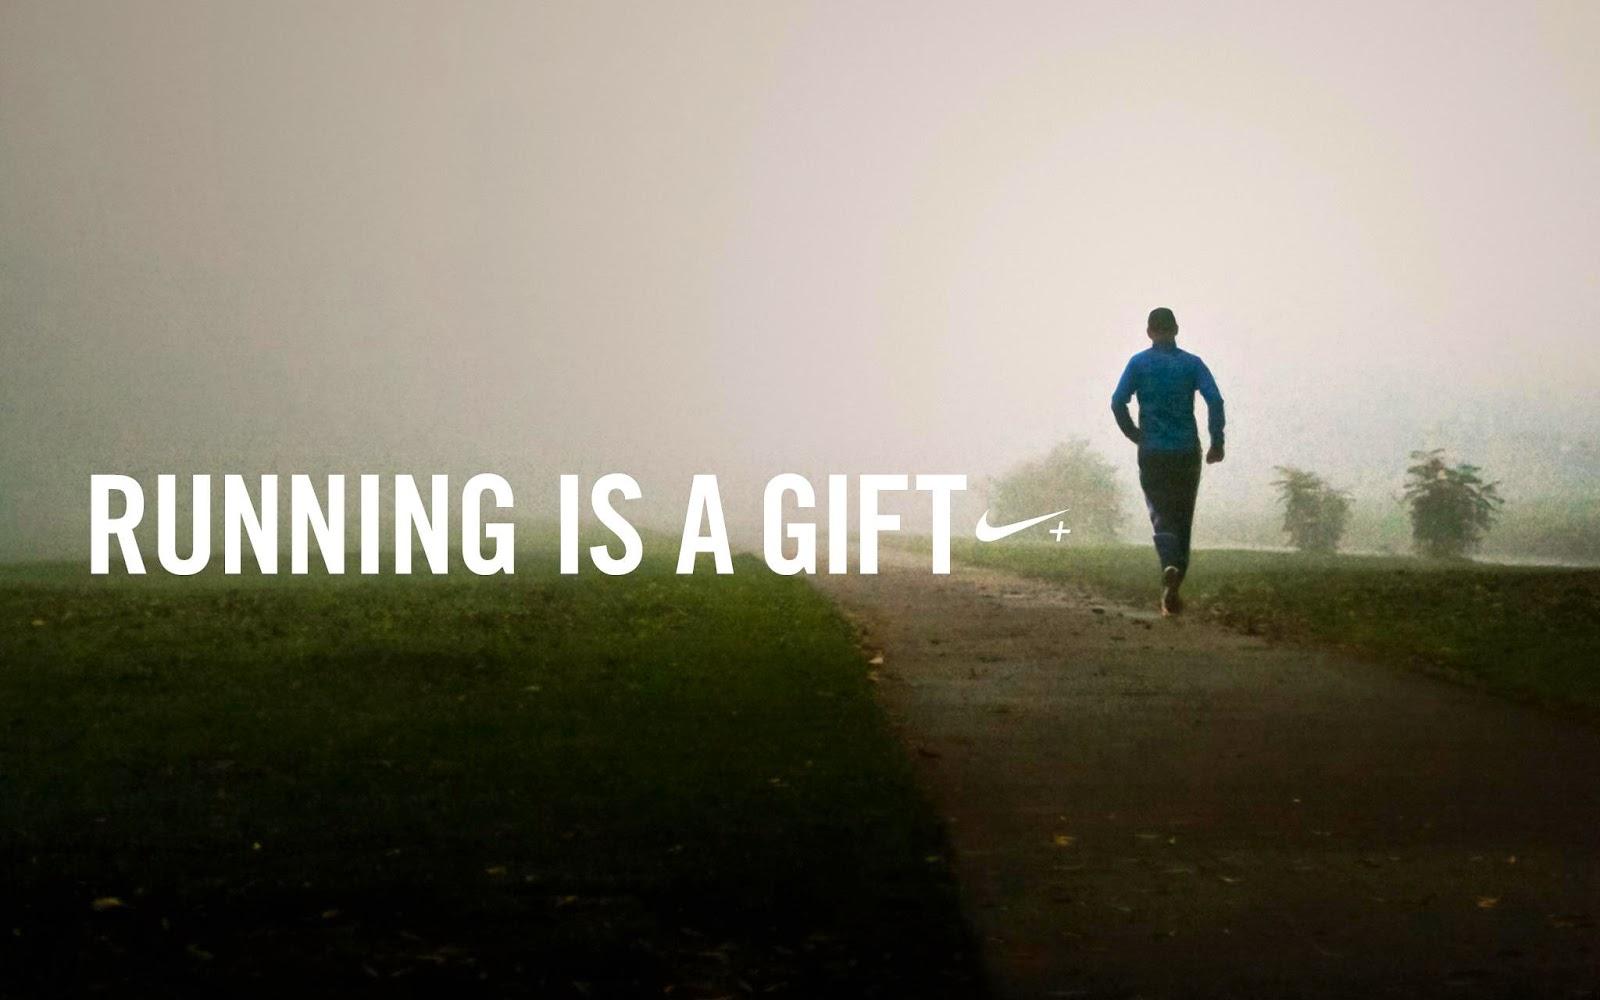 of Nike Running Quotes Health Wallpaper   best desktop backgrounds 1600x1000